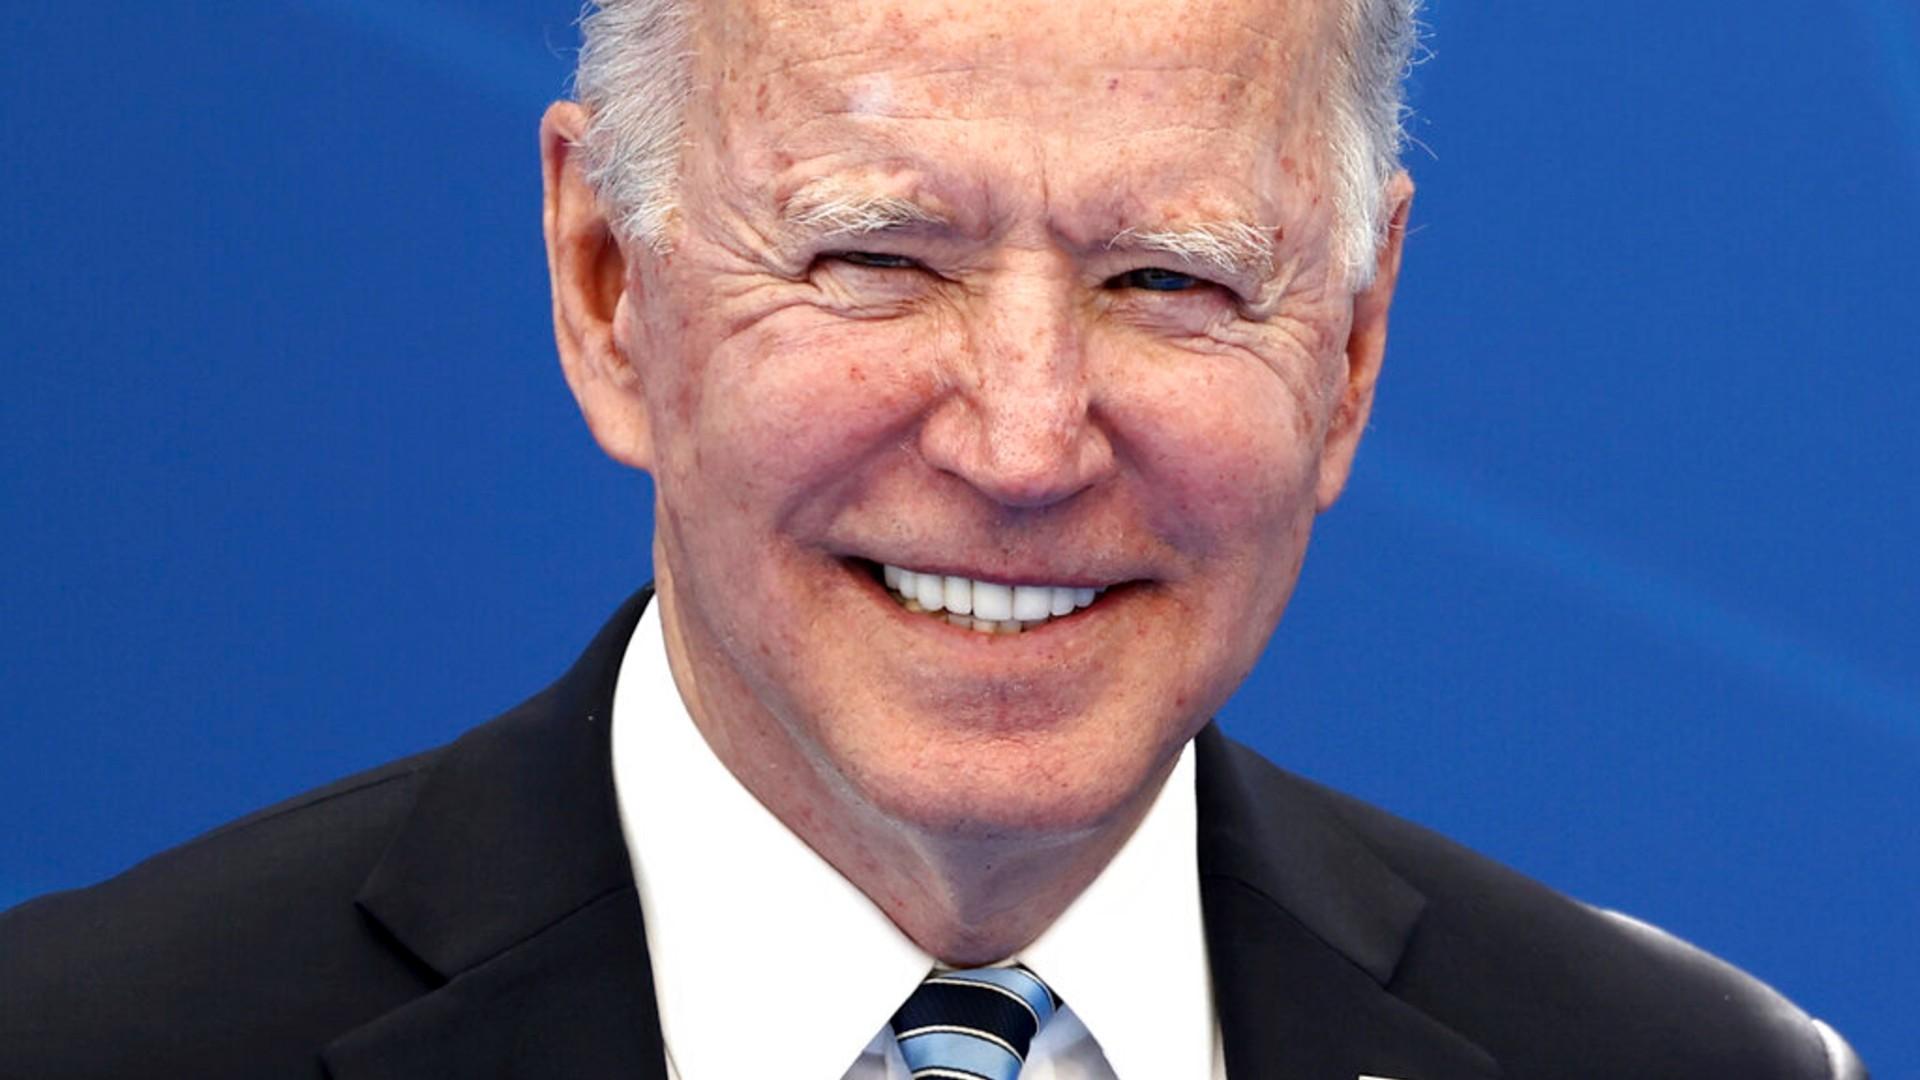 U.S. President Joe Biden arrives for a NATO summit at NATO headquarters in Brussels, Monday, June 14, 2021. (Kenzo Tribouillard, Pool via AP)